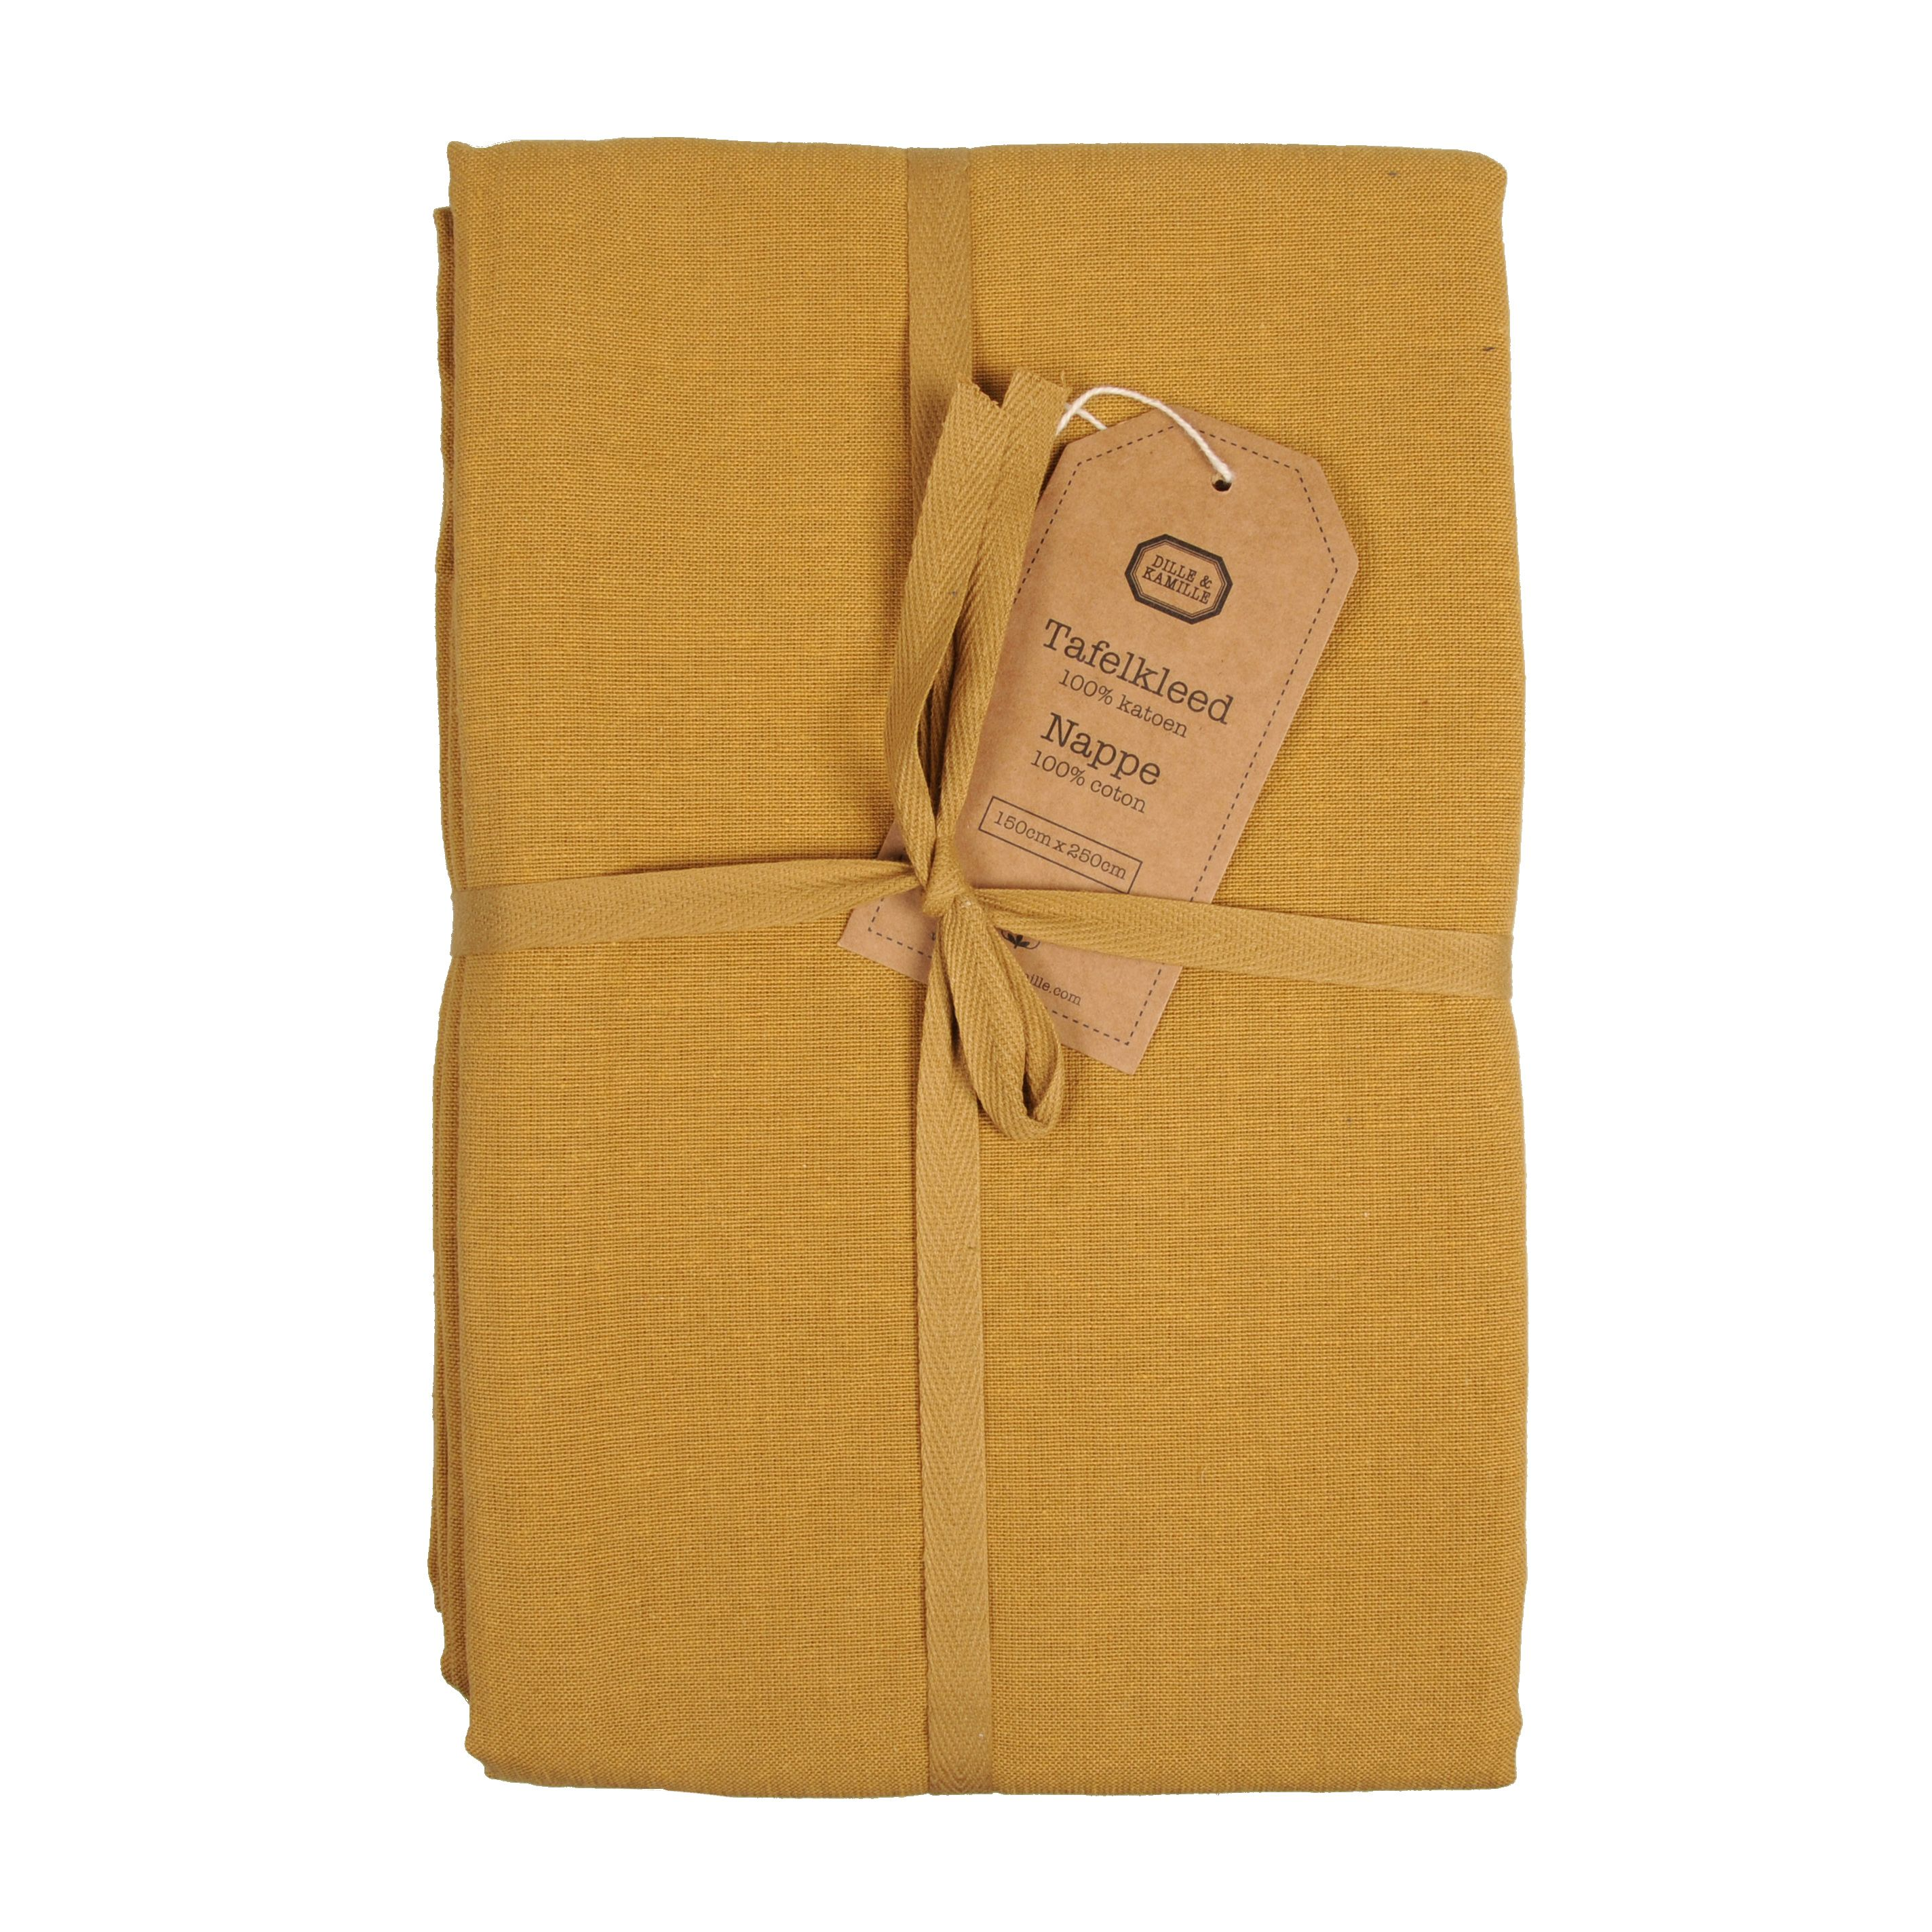 Beste Tafelkleed, geel, 140x180 cm NJ-63